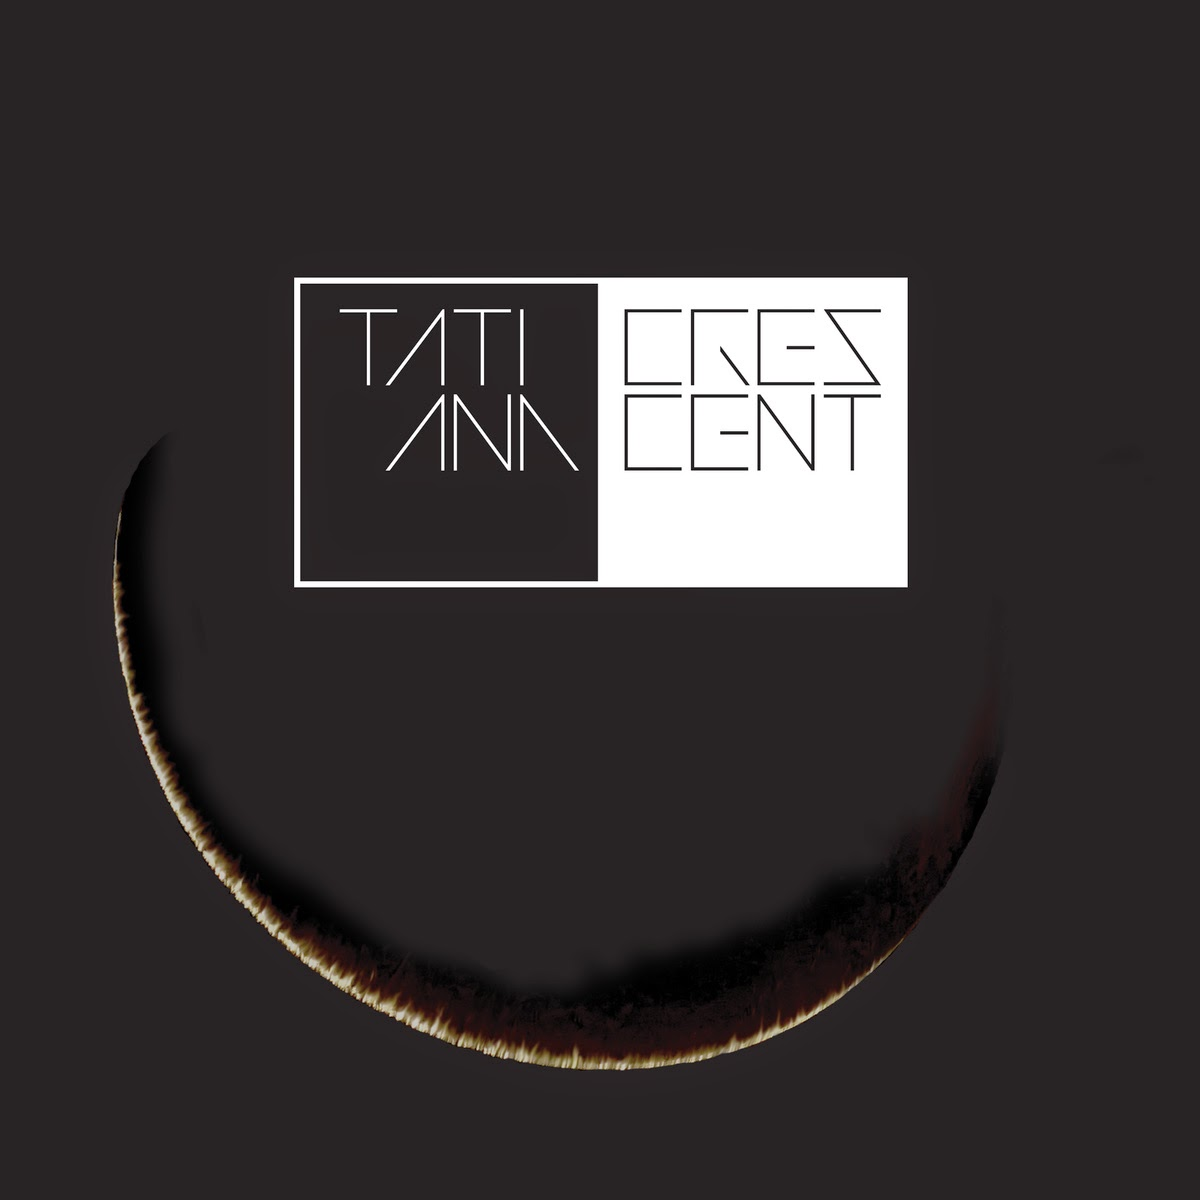 http://www.d4am.net/2014/06/tati-ana-crescent.html